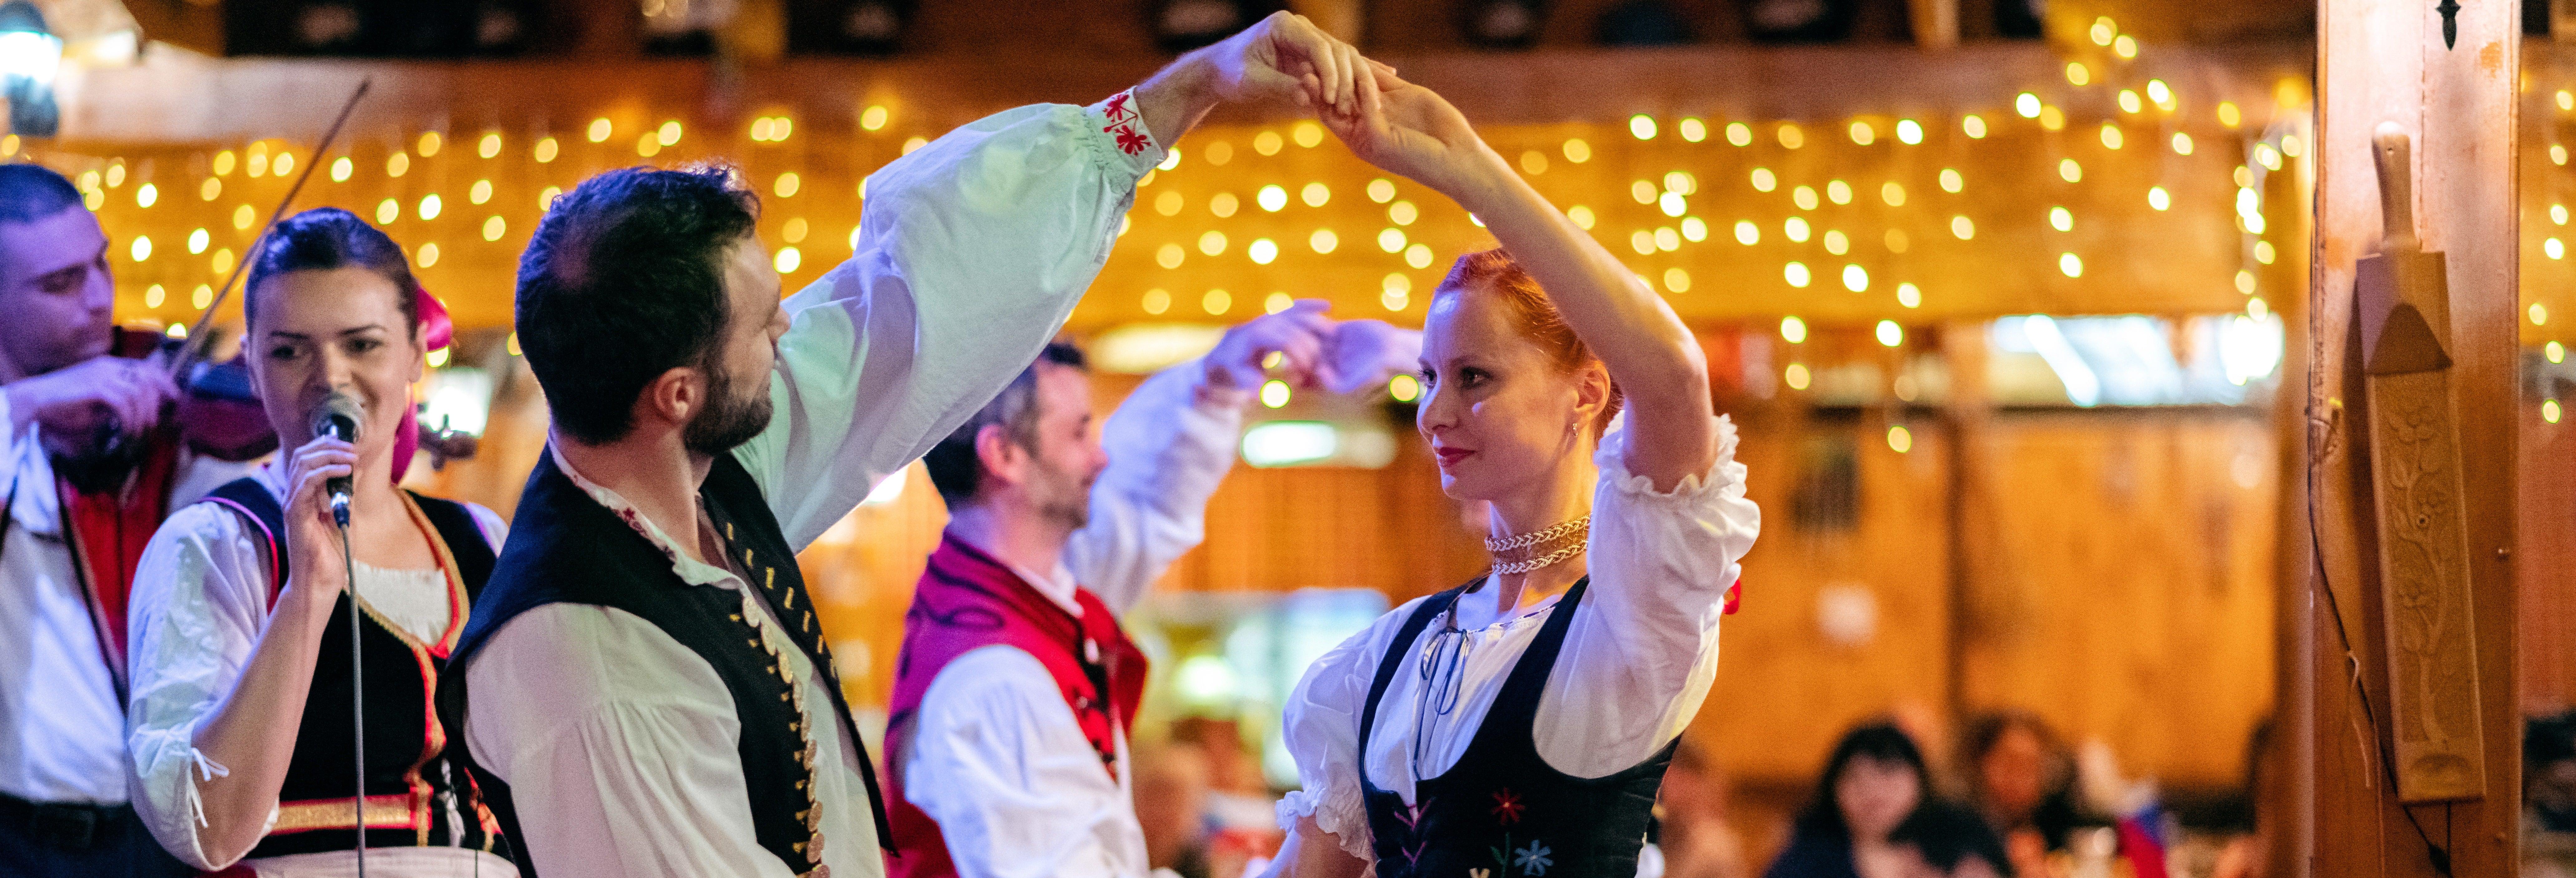 Dîner-spectacle folklorique avec open-bar